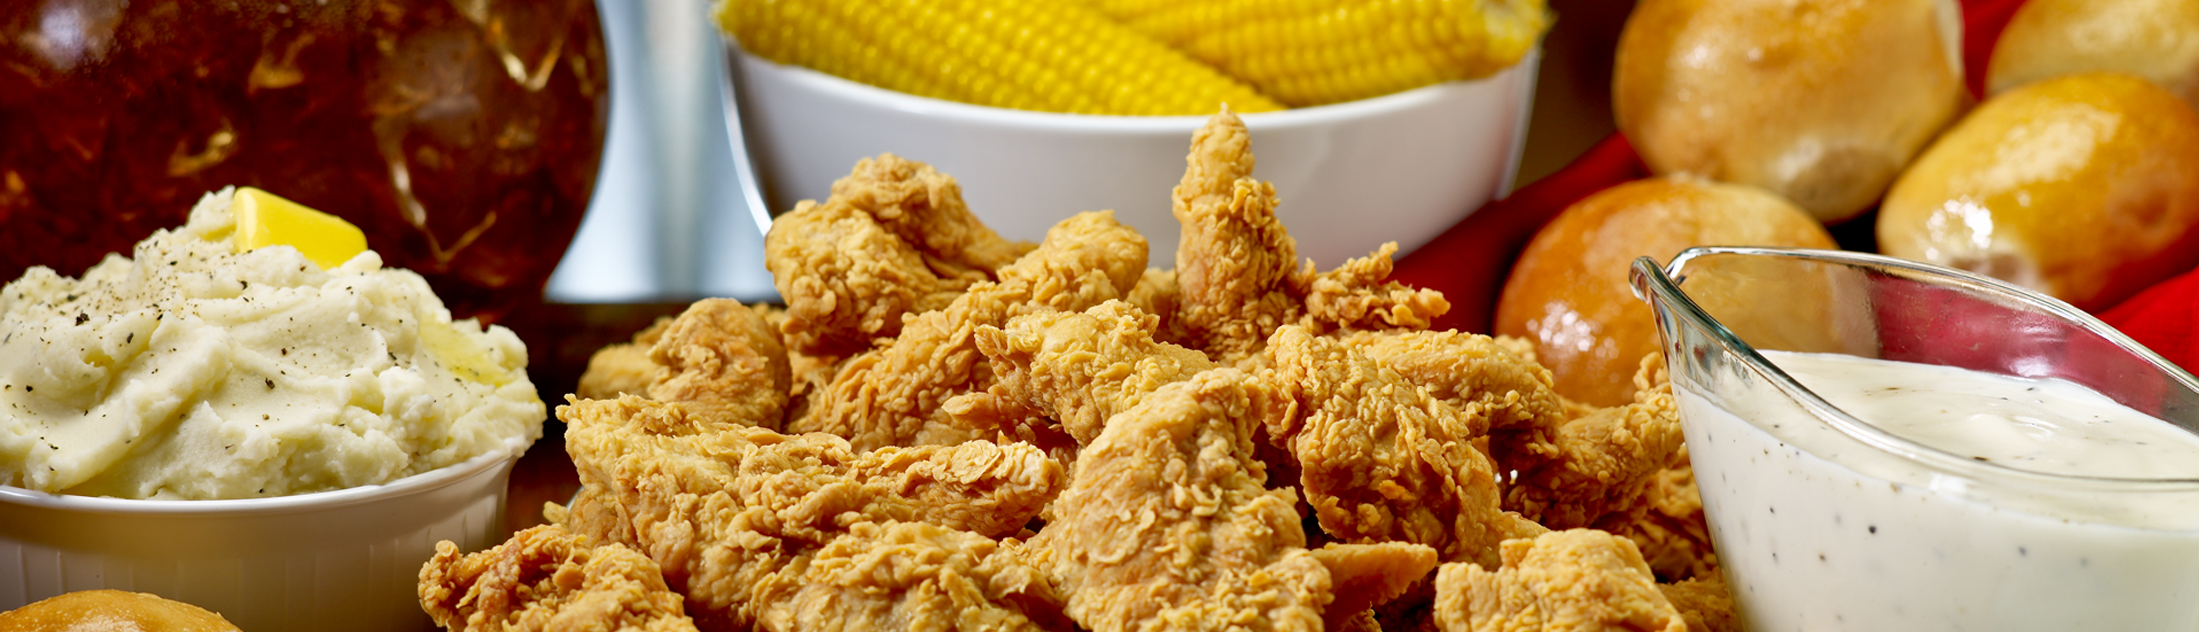 Chicken Express - Chicken Express – providing fast, friendly